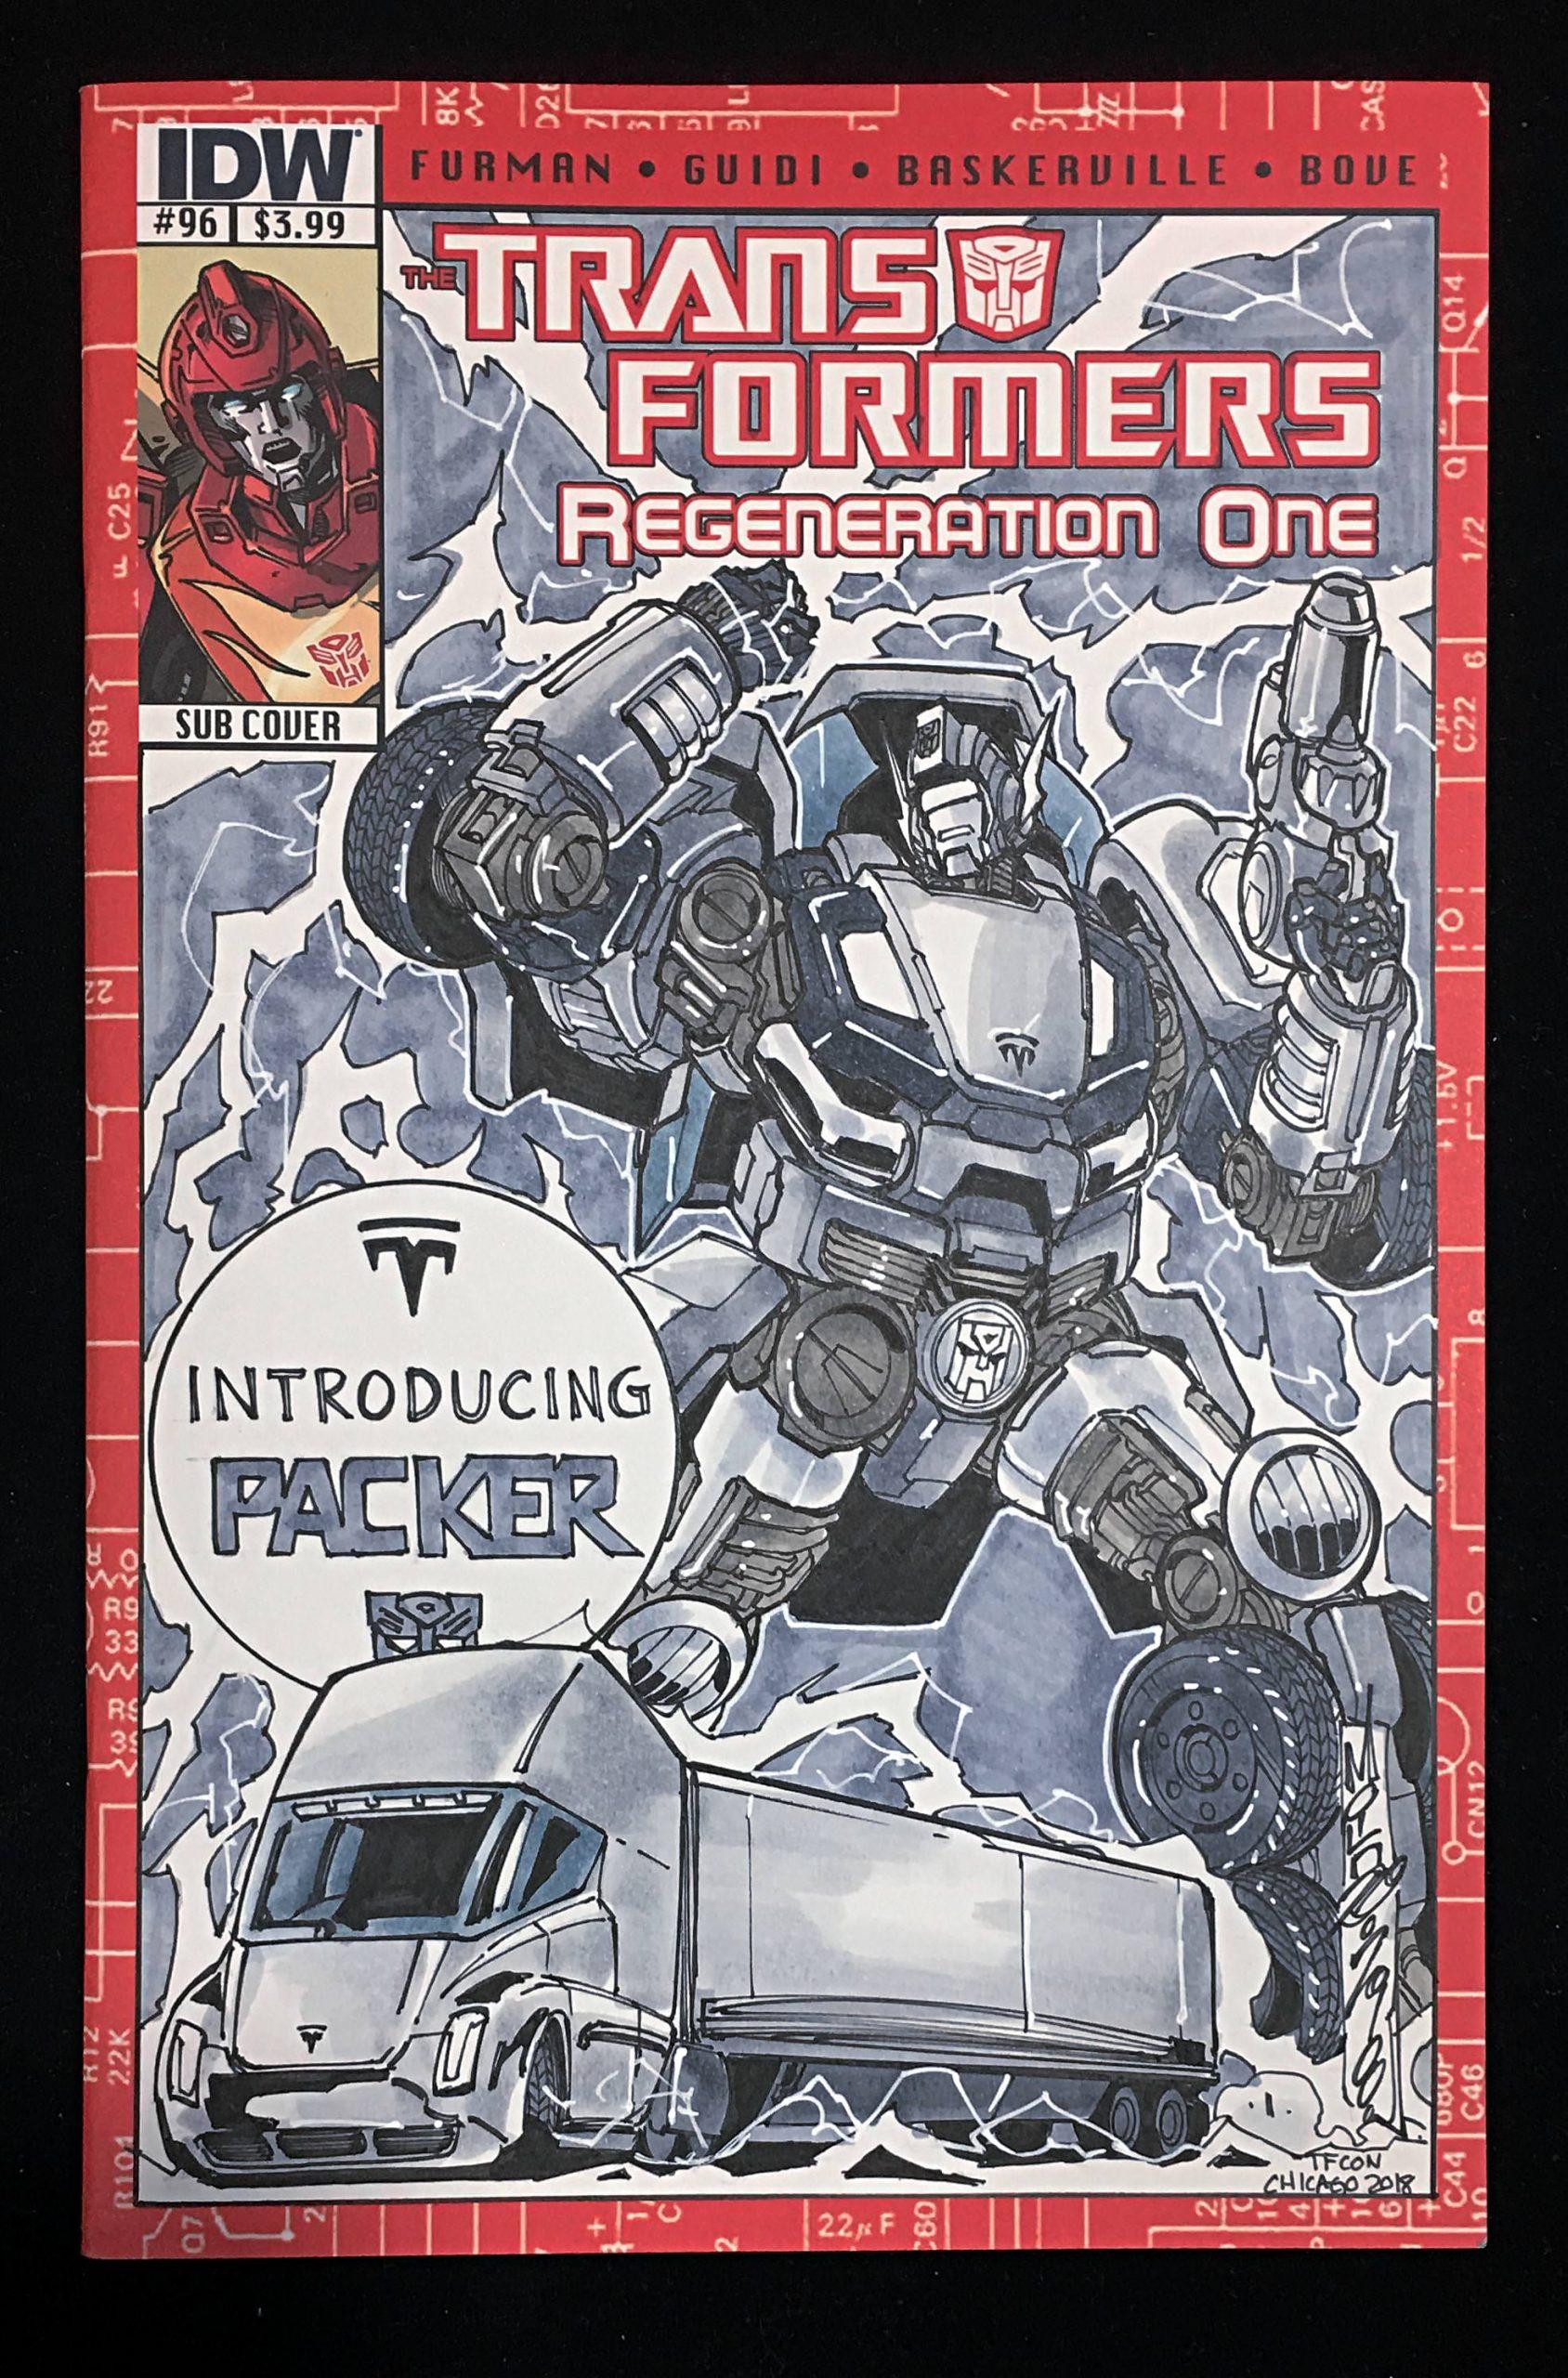 Tesla Semi Transformers Comic (Credit: Artist/Alix Milne, Yoshi)